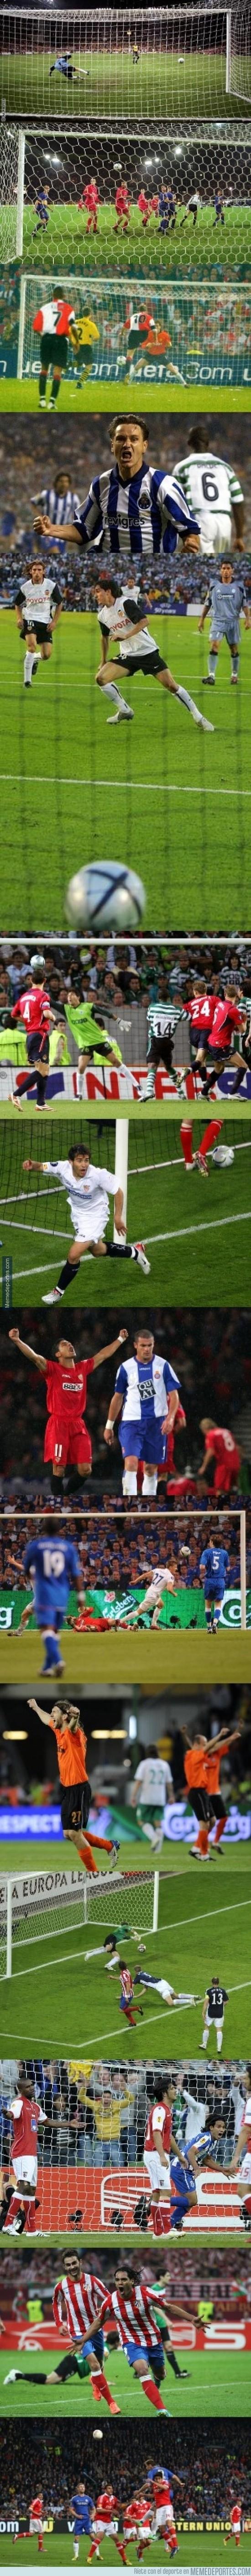 273897 - ¡Hoy Europa League! Momentos e Imágenes de las finales de la Europa League del siglo XXI